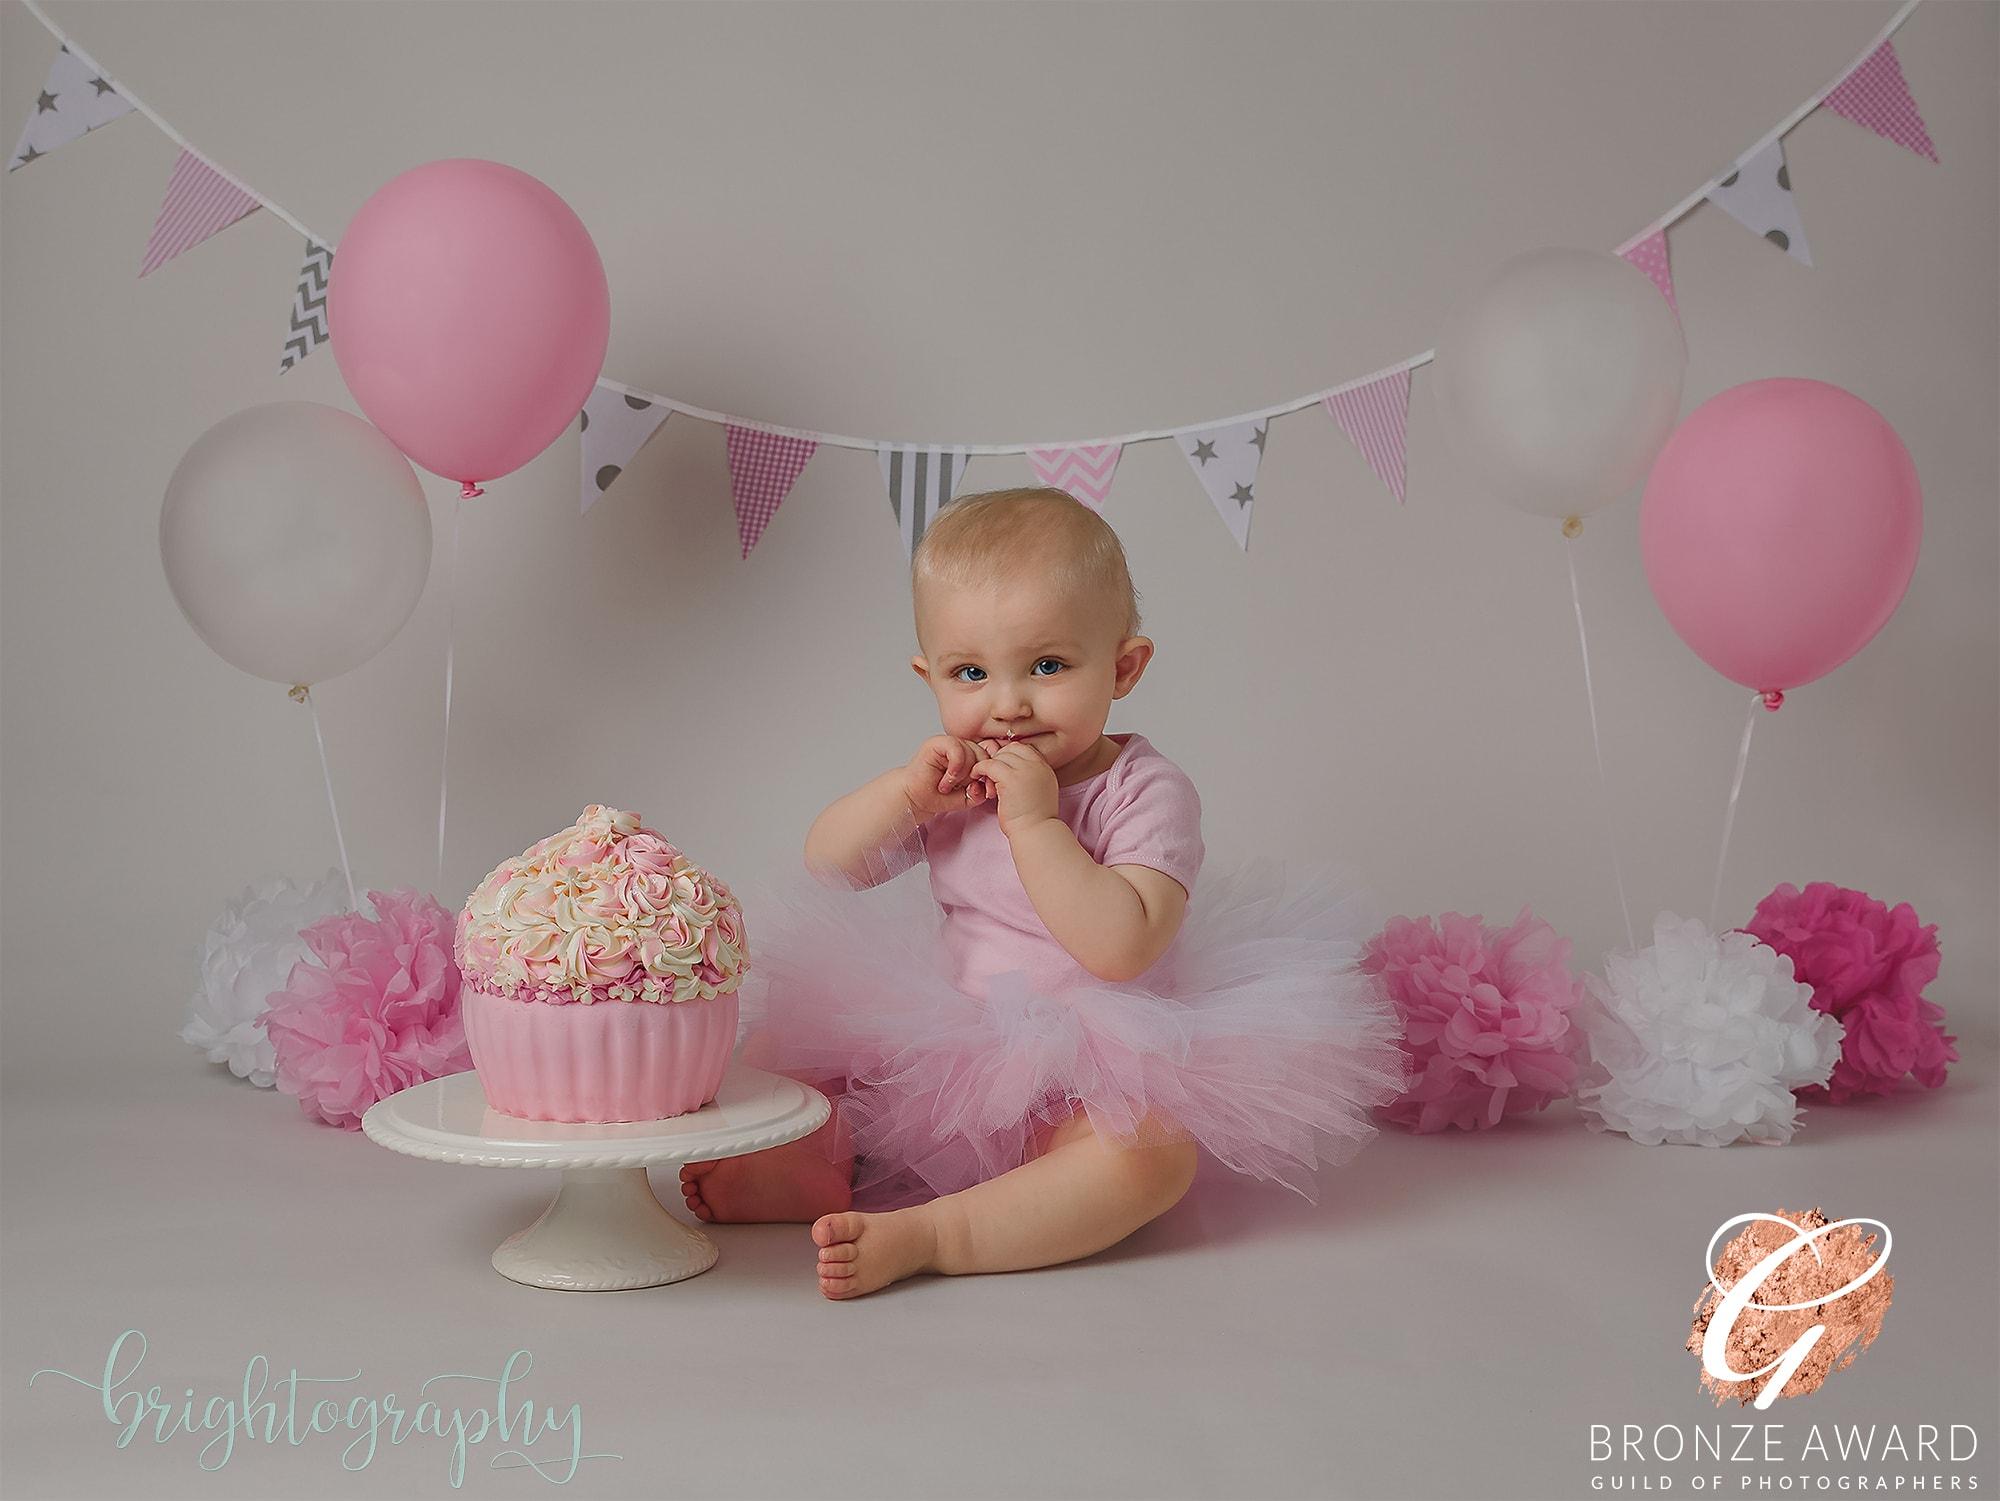 baby girl with pink giant cupcake and tutu at brighton cake smash photoshoot